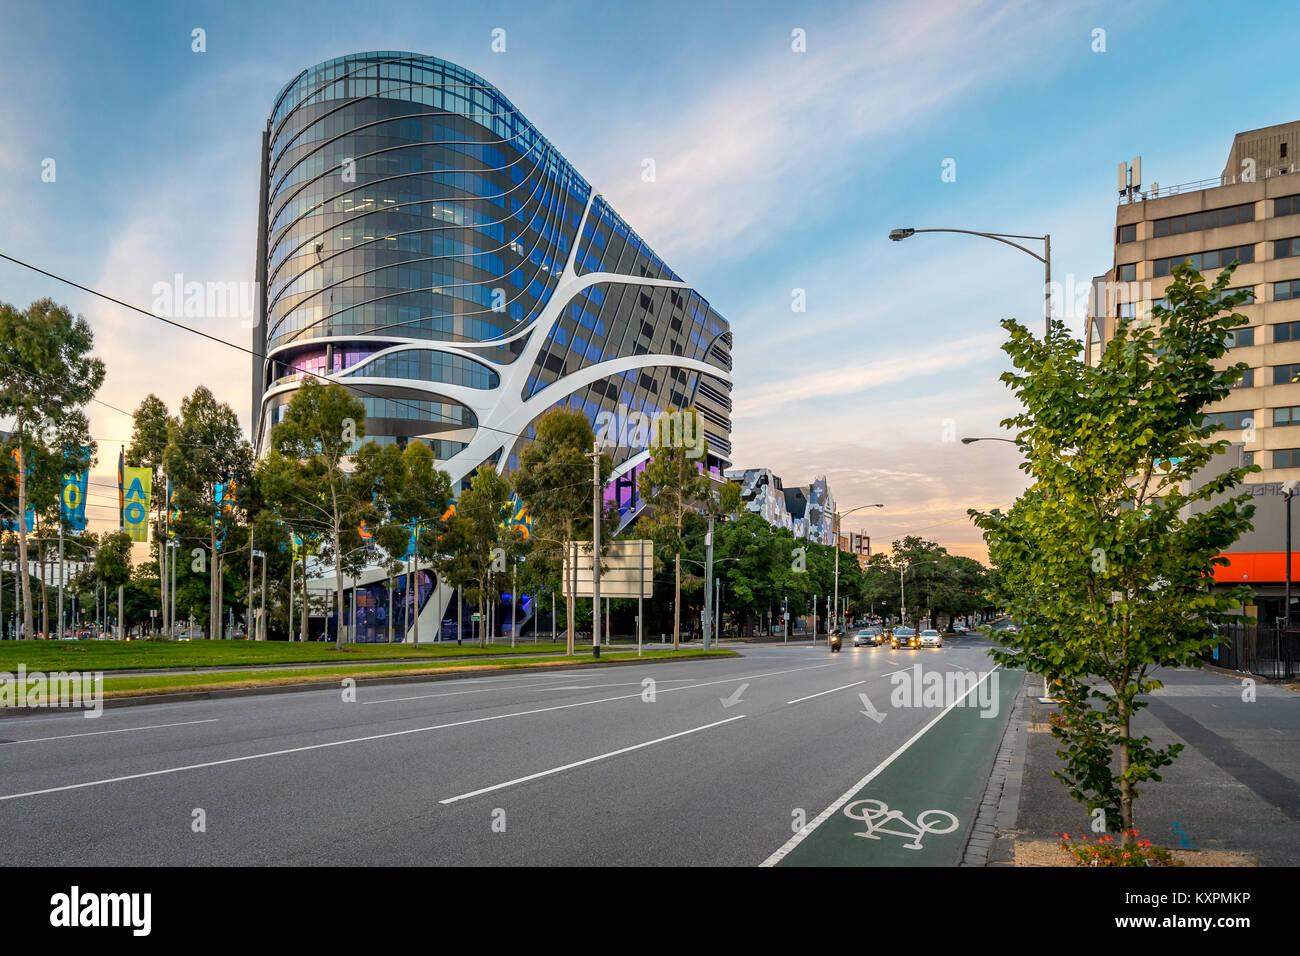 Peter MacCallum cancer centre in Melbourne, Australia - Stock Image